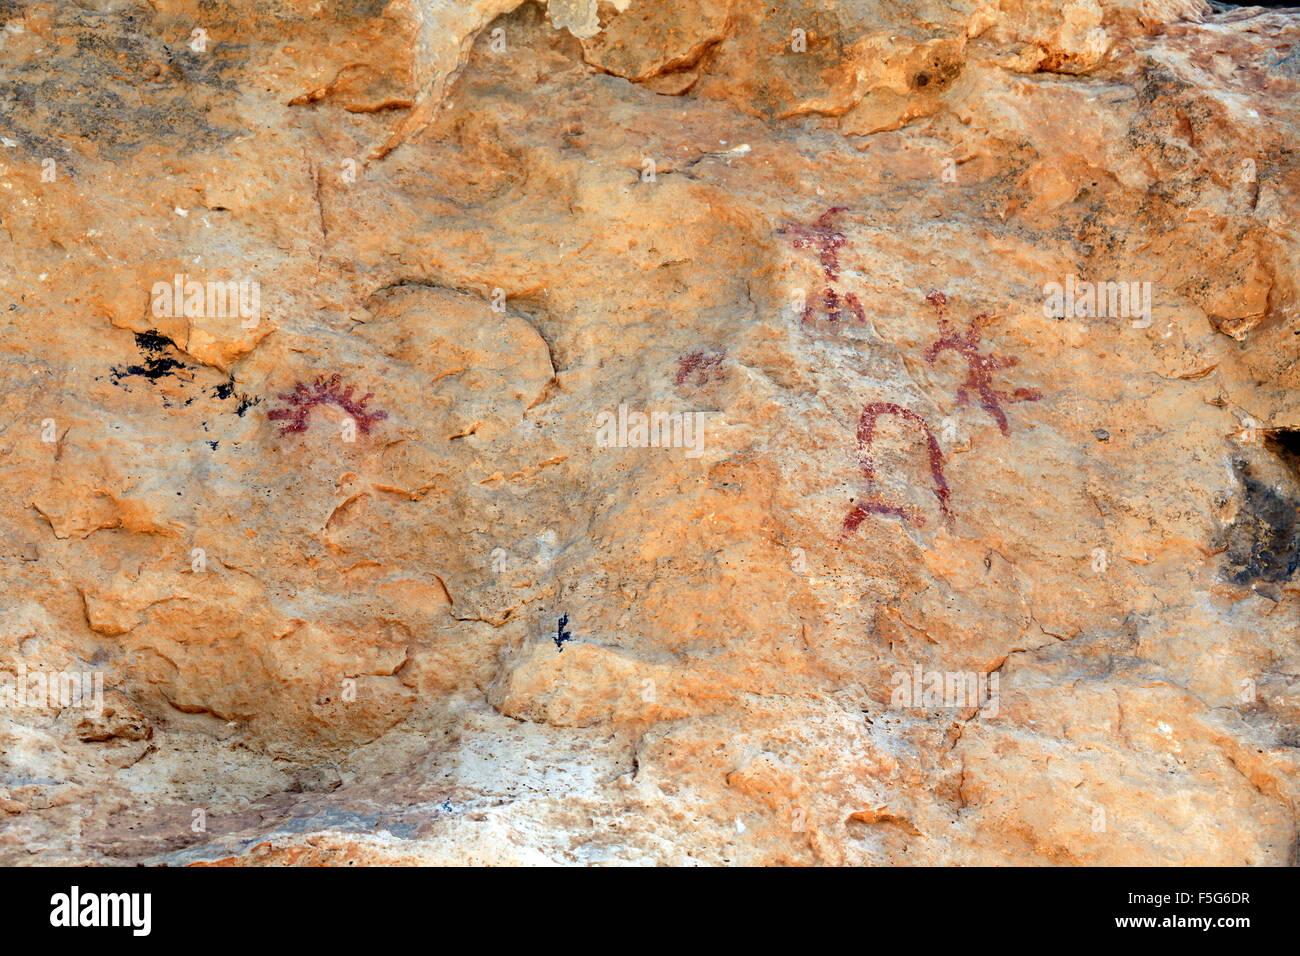 Prehistoric paintings in the cave Portell de les Lletres, near Montblanc, Tarragona, Catalonia, Spain. UNESCO World - Stock Image